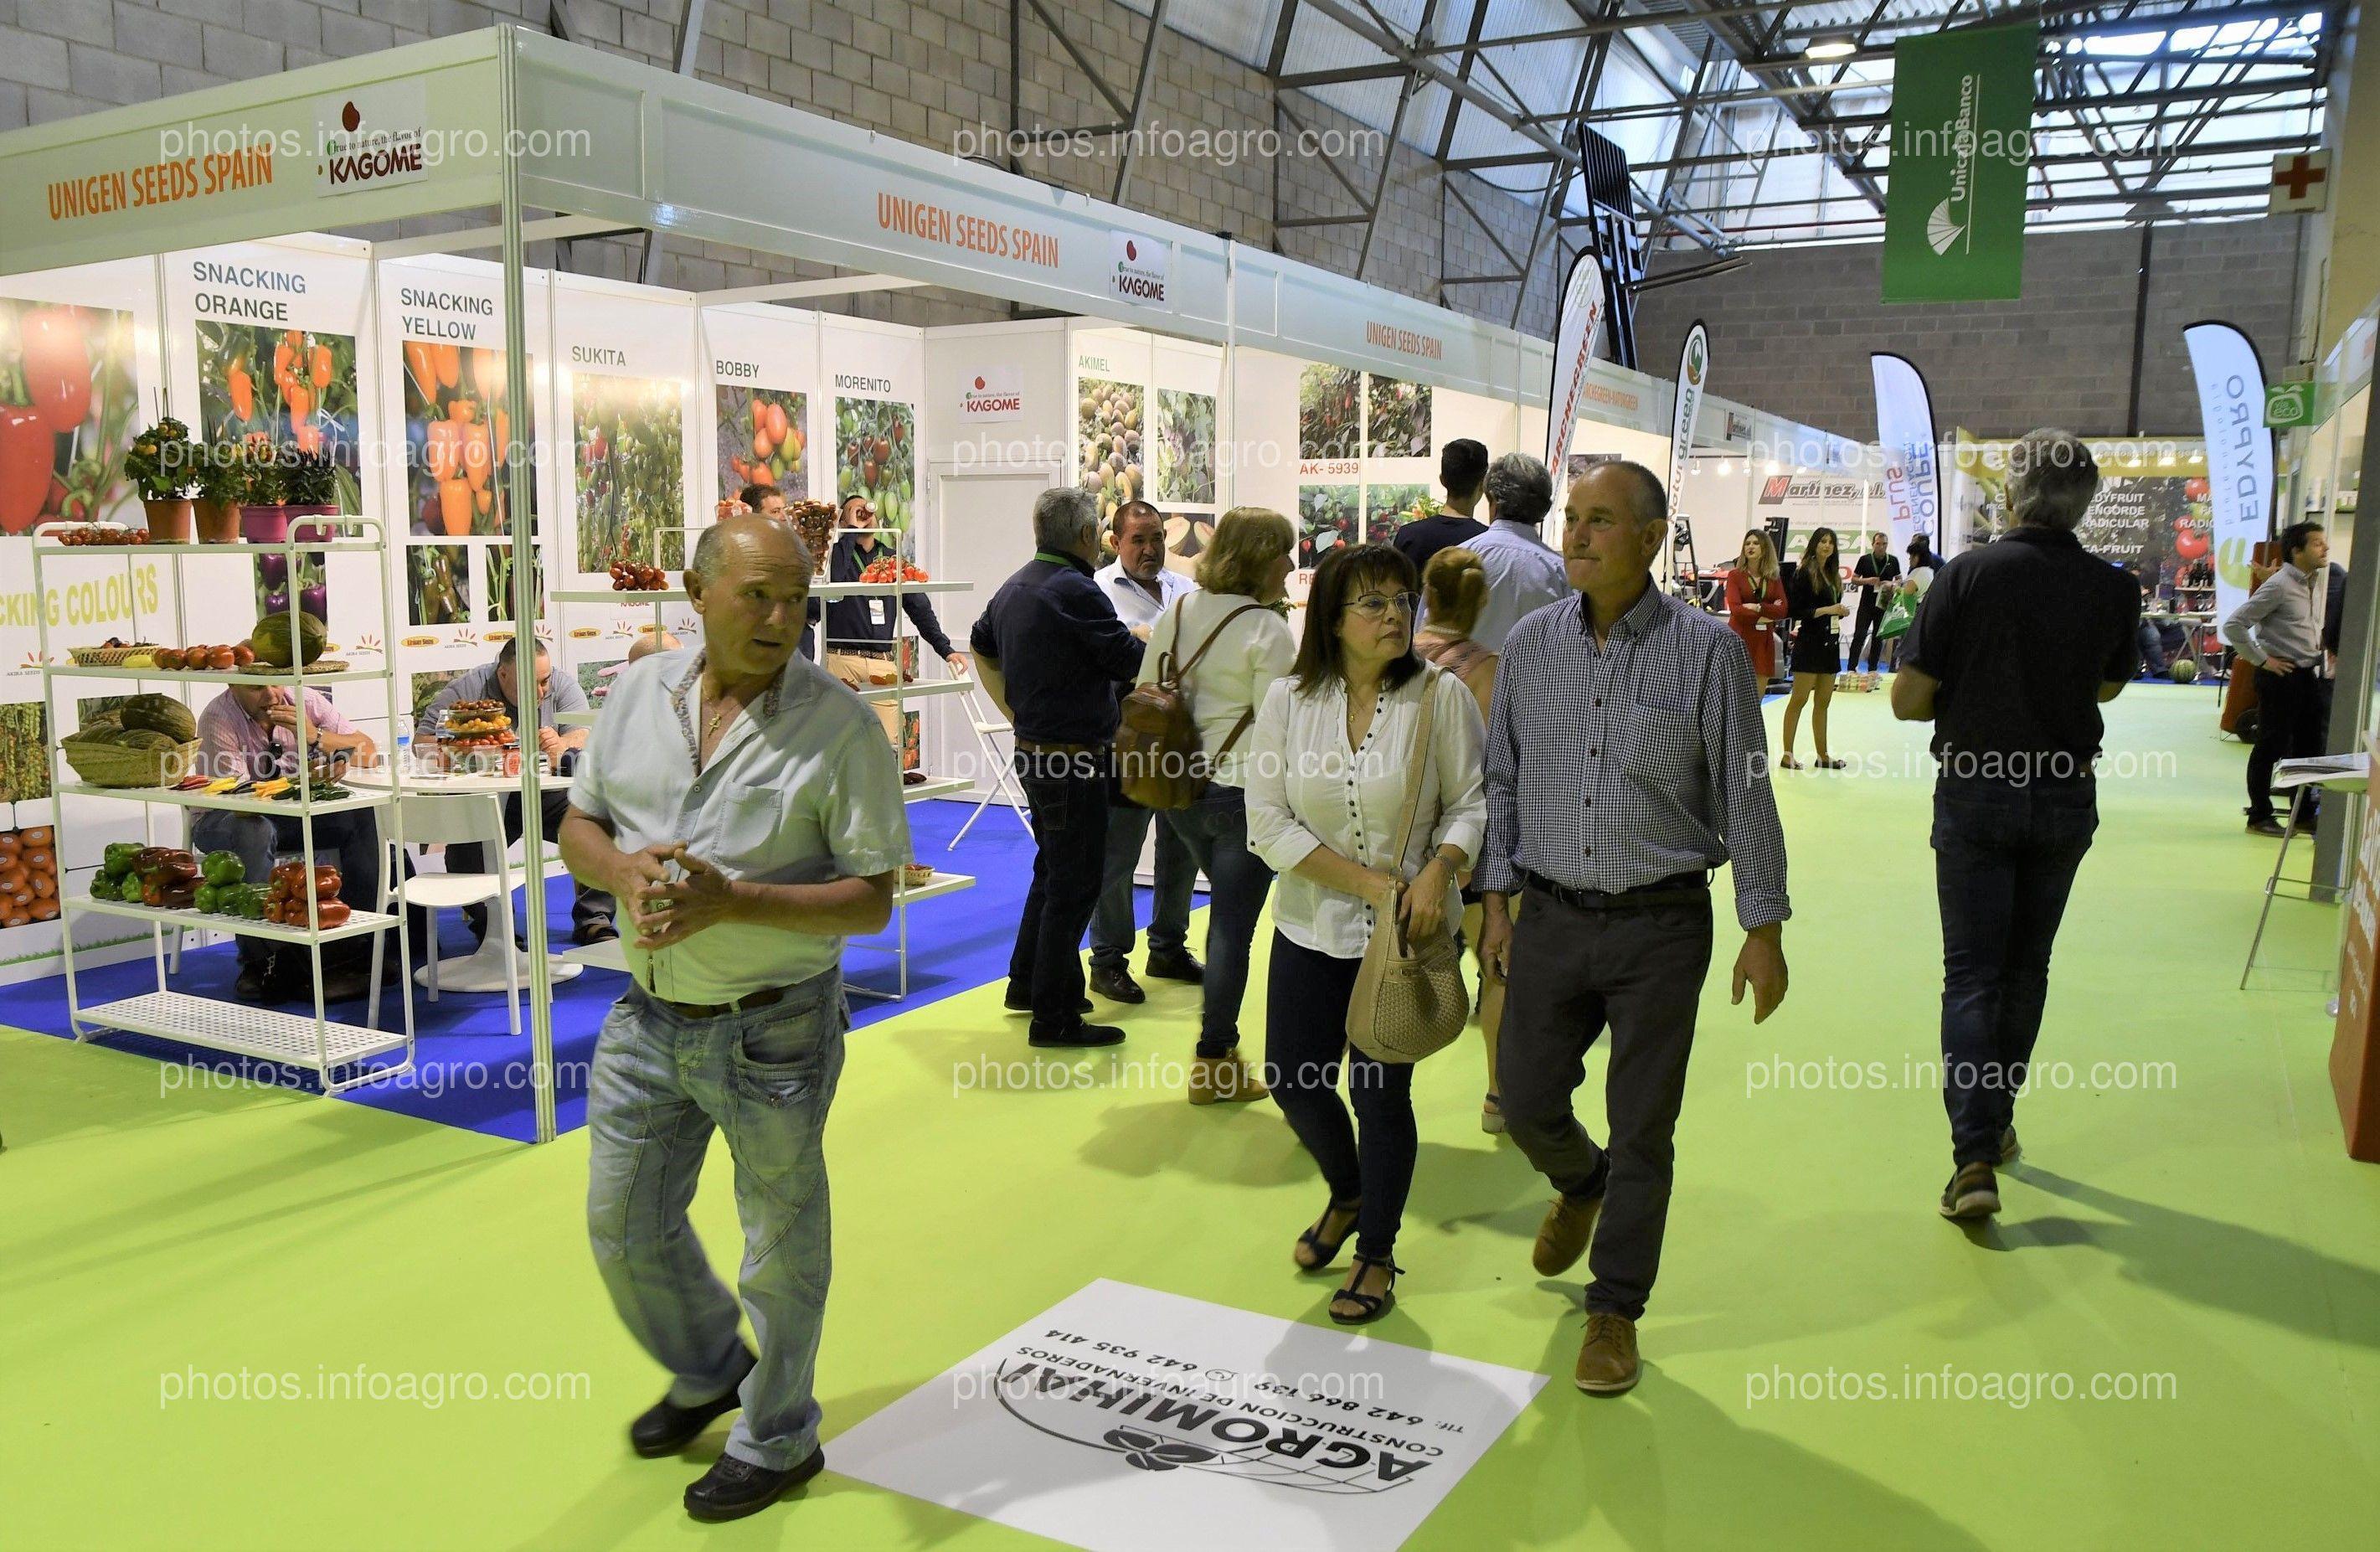 Unigen Seeds - Stand Infoagro Exhibition